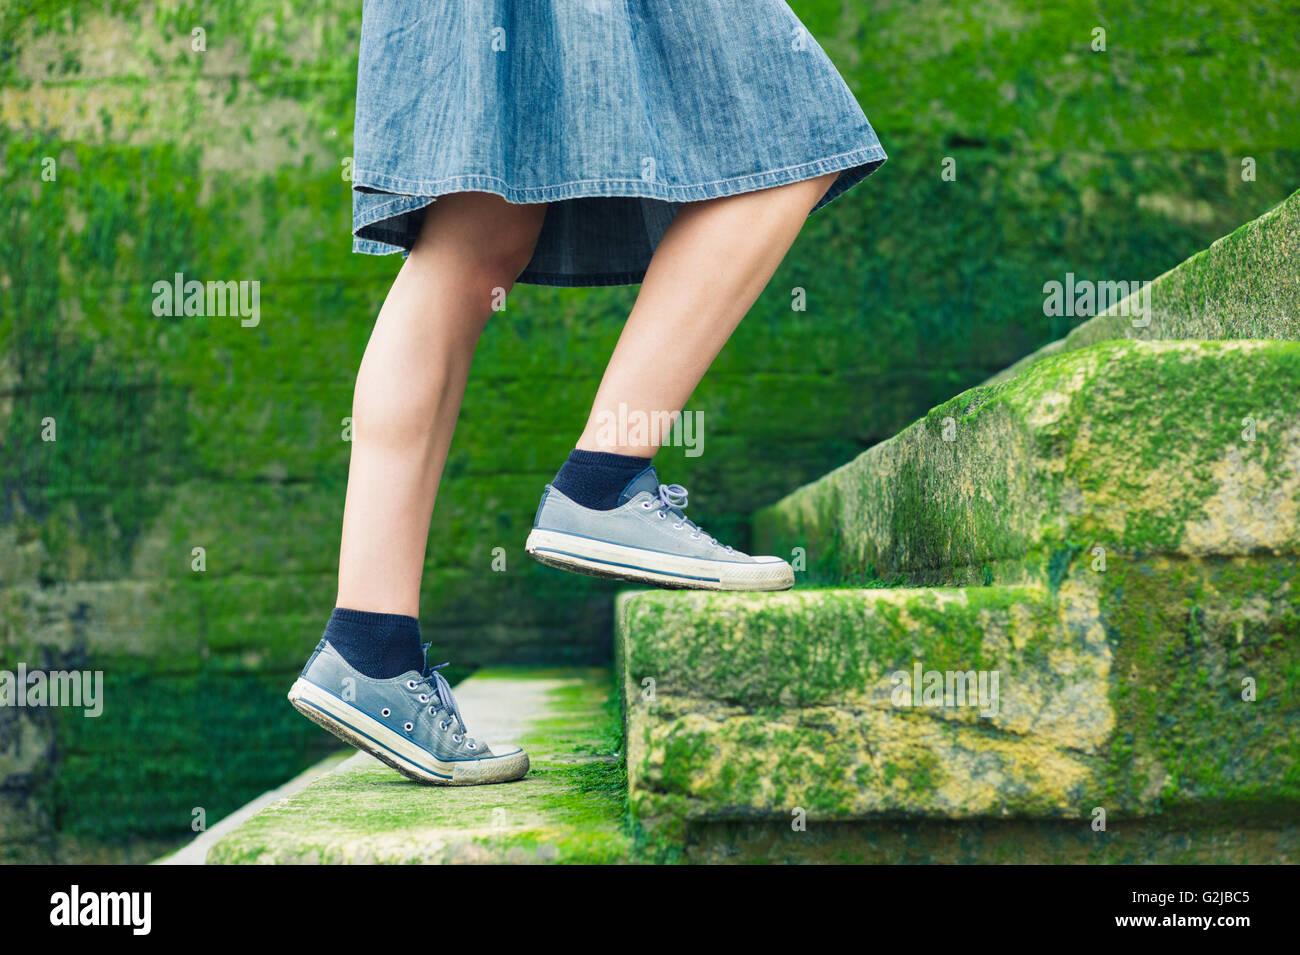 5551f3d9e Stairs Woman Skirt Imágenes De Stock & Stairs Woman Skirt Fotos De ...